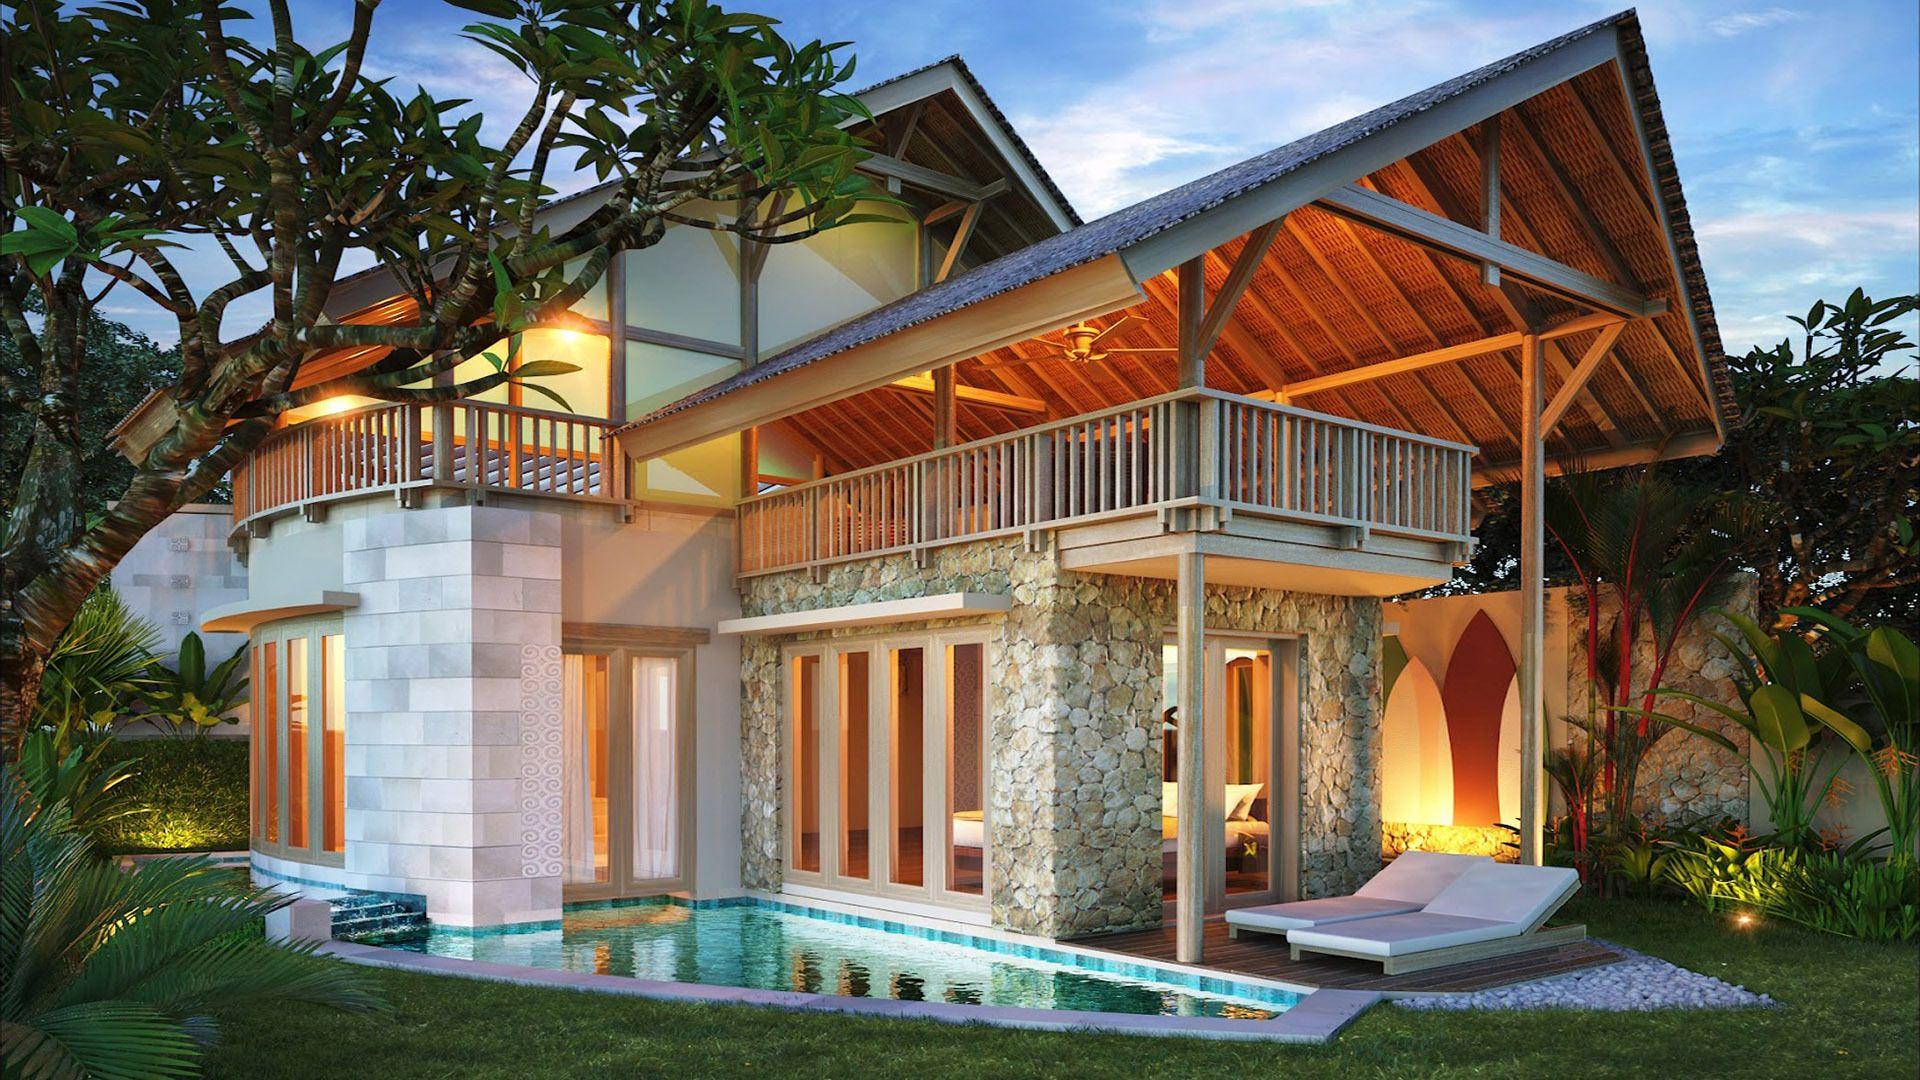 Beautiful Dream House Wallpaper High Quality Resolution with High Definition Wallpaper Resolution 1920x1080 px 717.36 KB